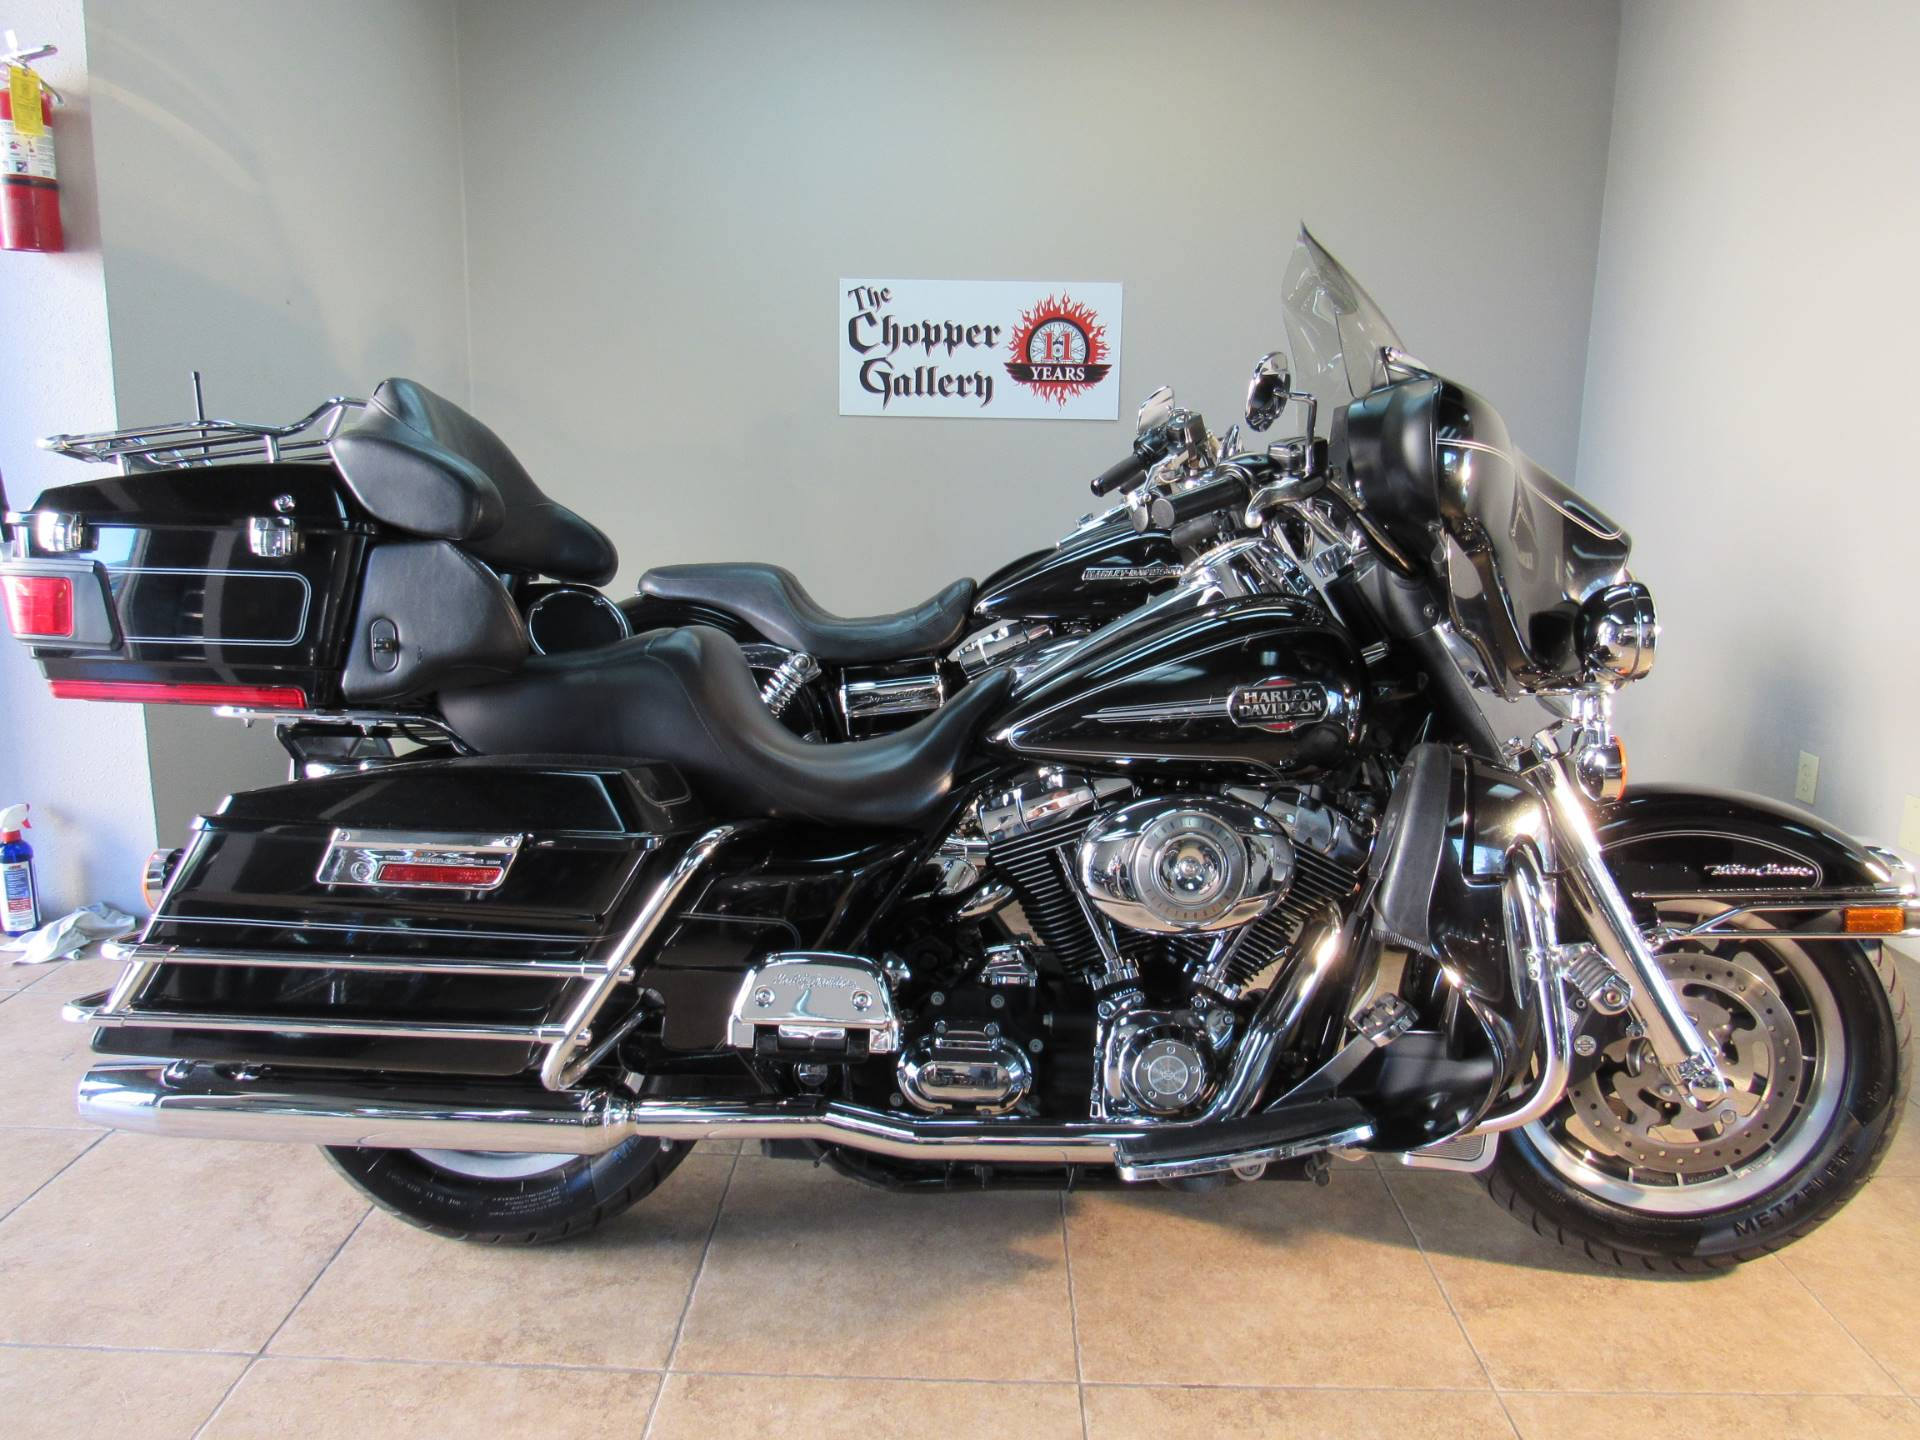 2008 Harley Davidson Ultra Clic Electra Glide In Temecula California Photo